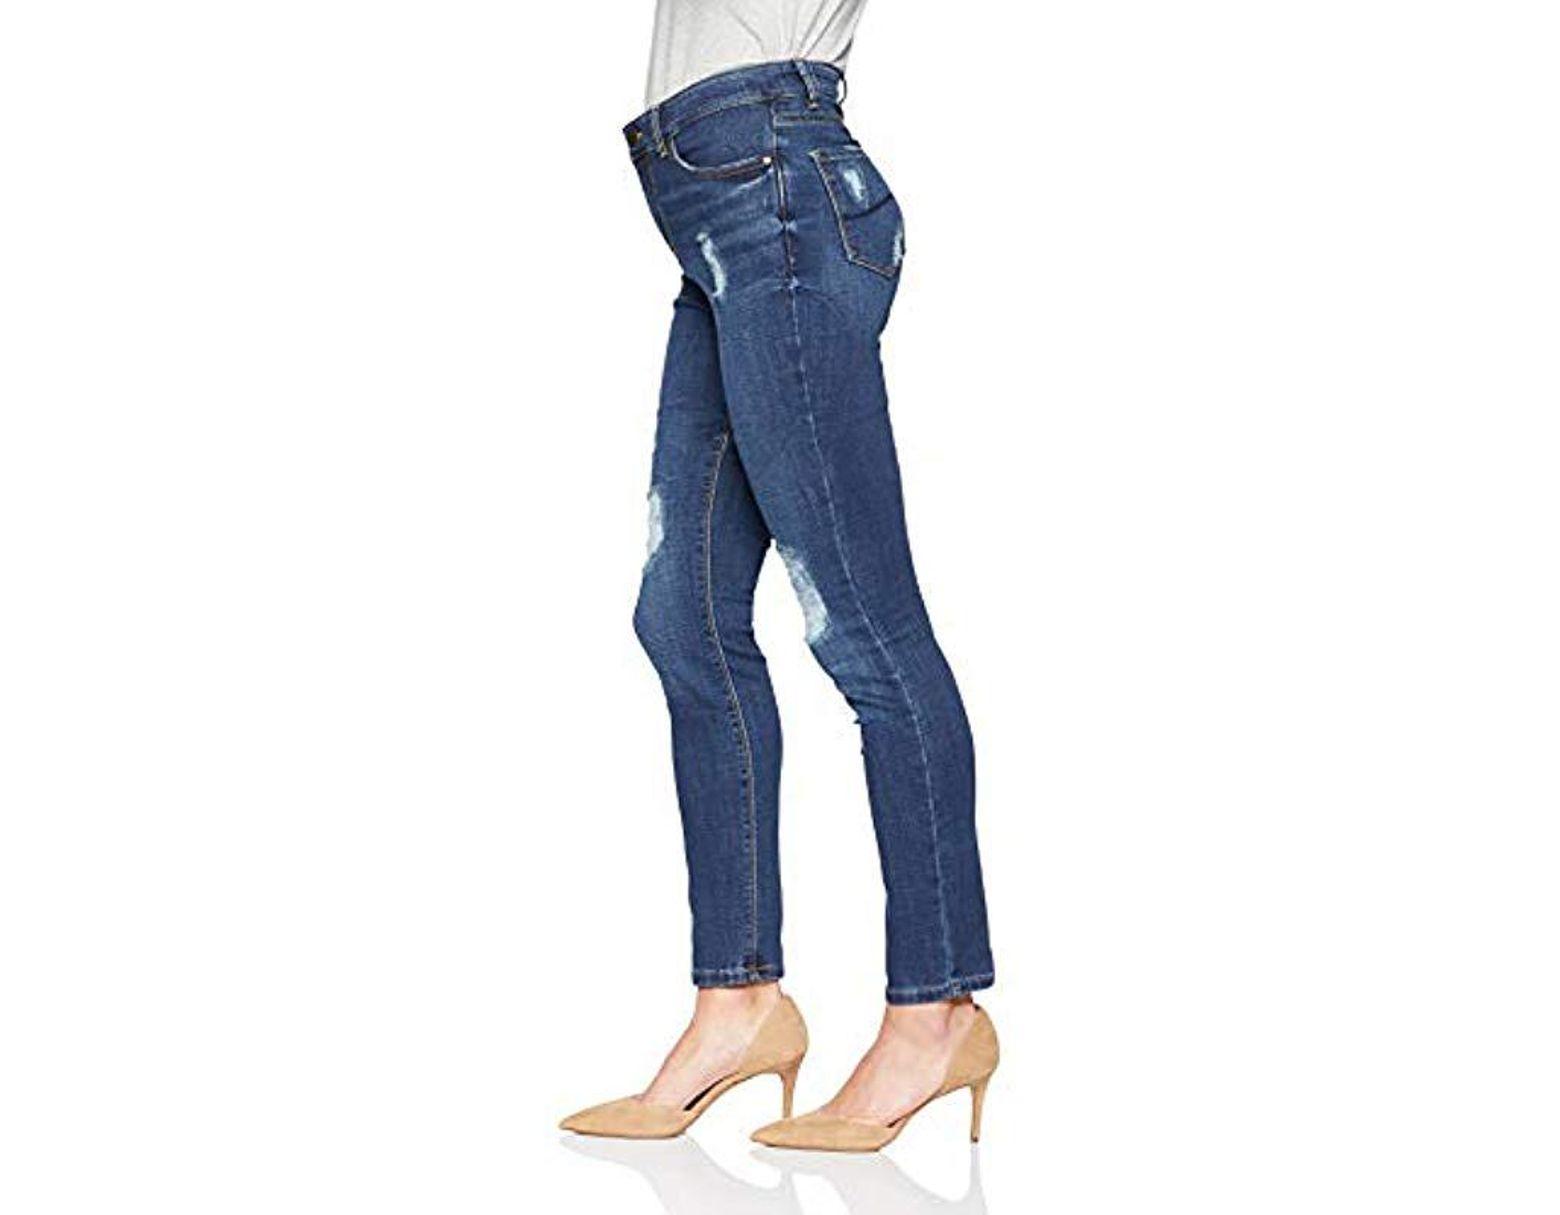 2f9c159c Lee Jeans Dream Soft Slim Fit Skinny Leg Jean in Blue - Lyst